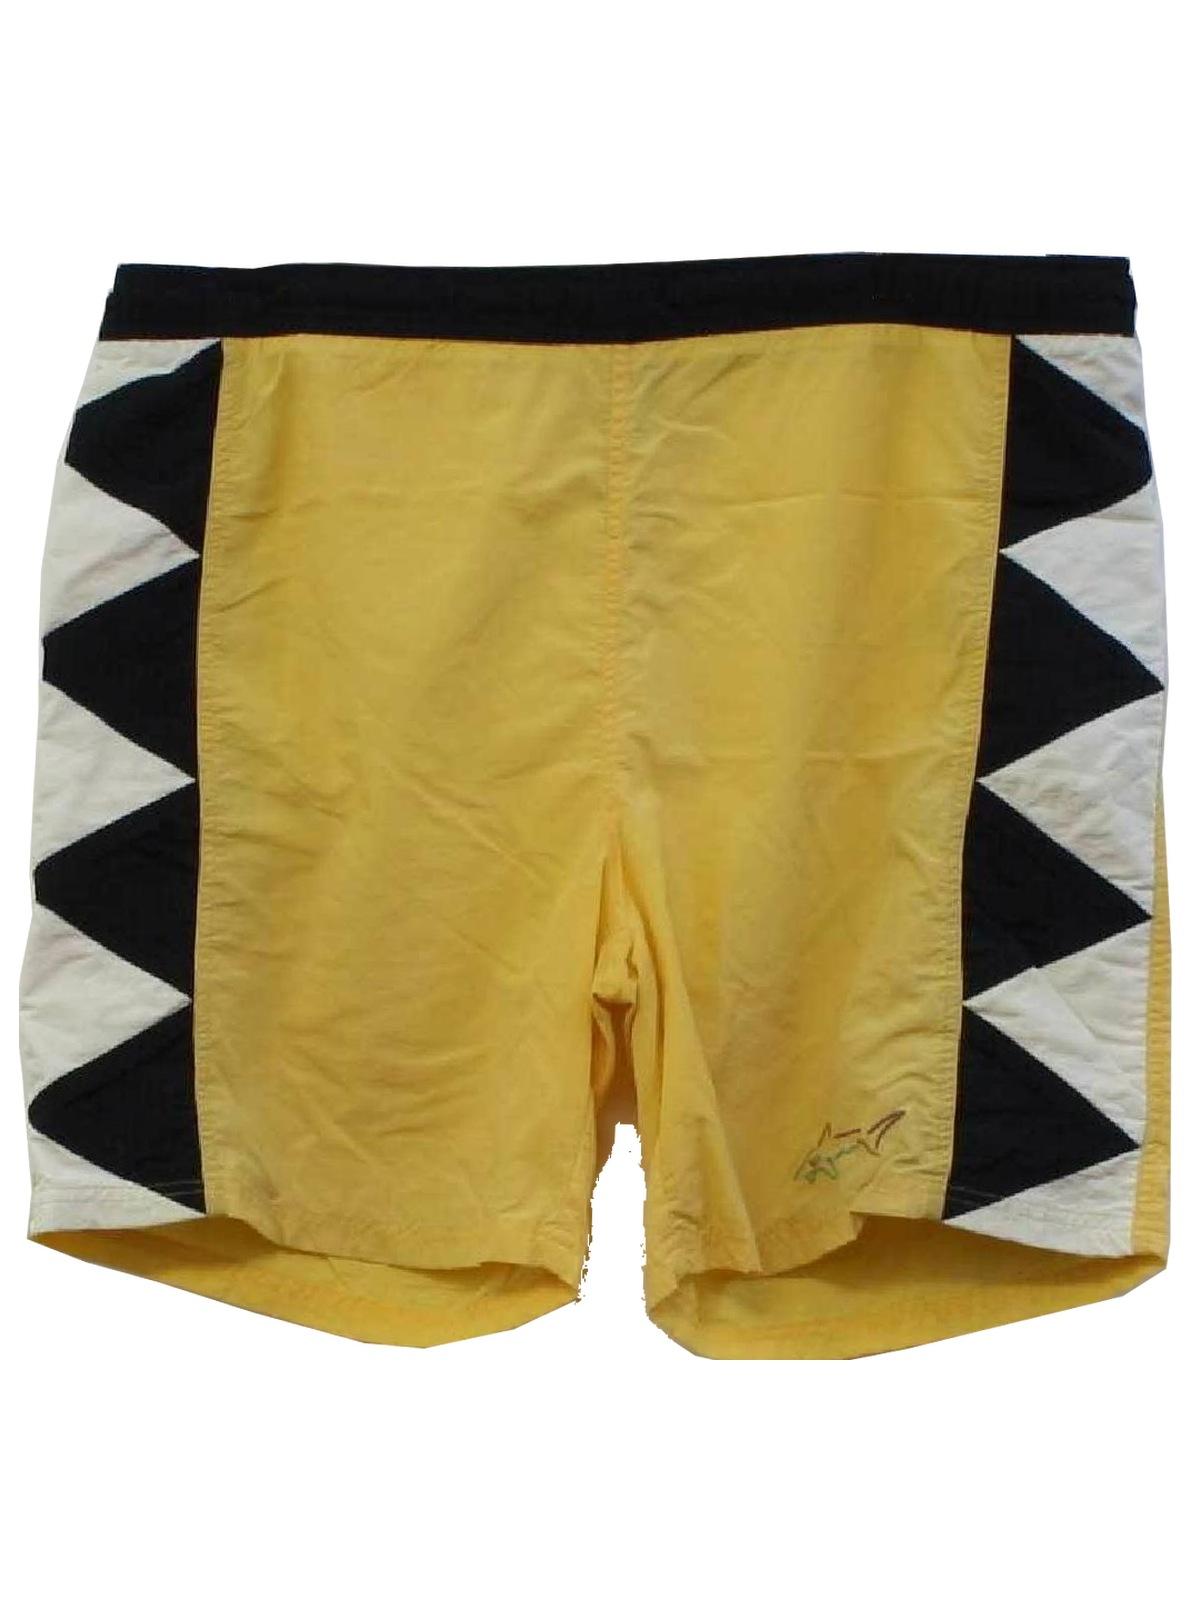 b3f13def14 Retro 90's Swimsuit/Swimwear: 90s -Greg Norman- Mens yellow background with  black and white side seam zig zag design nylon, polyester mesh brief lined  swim ...